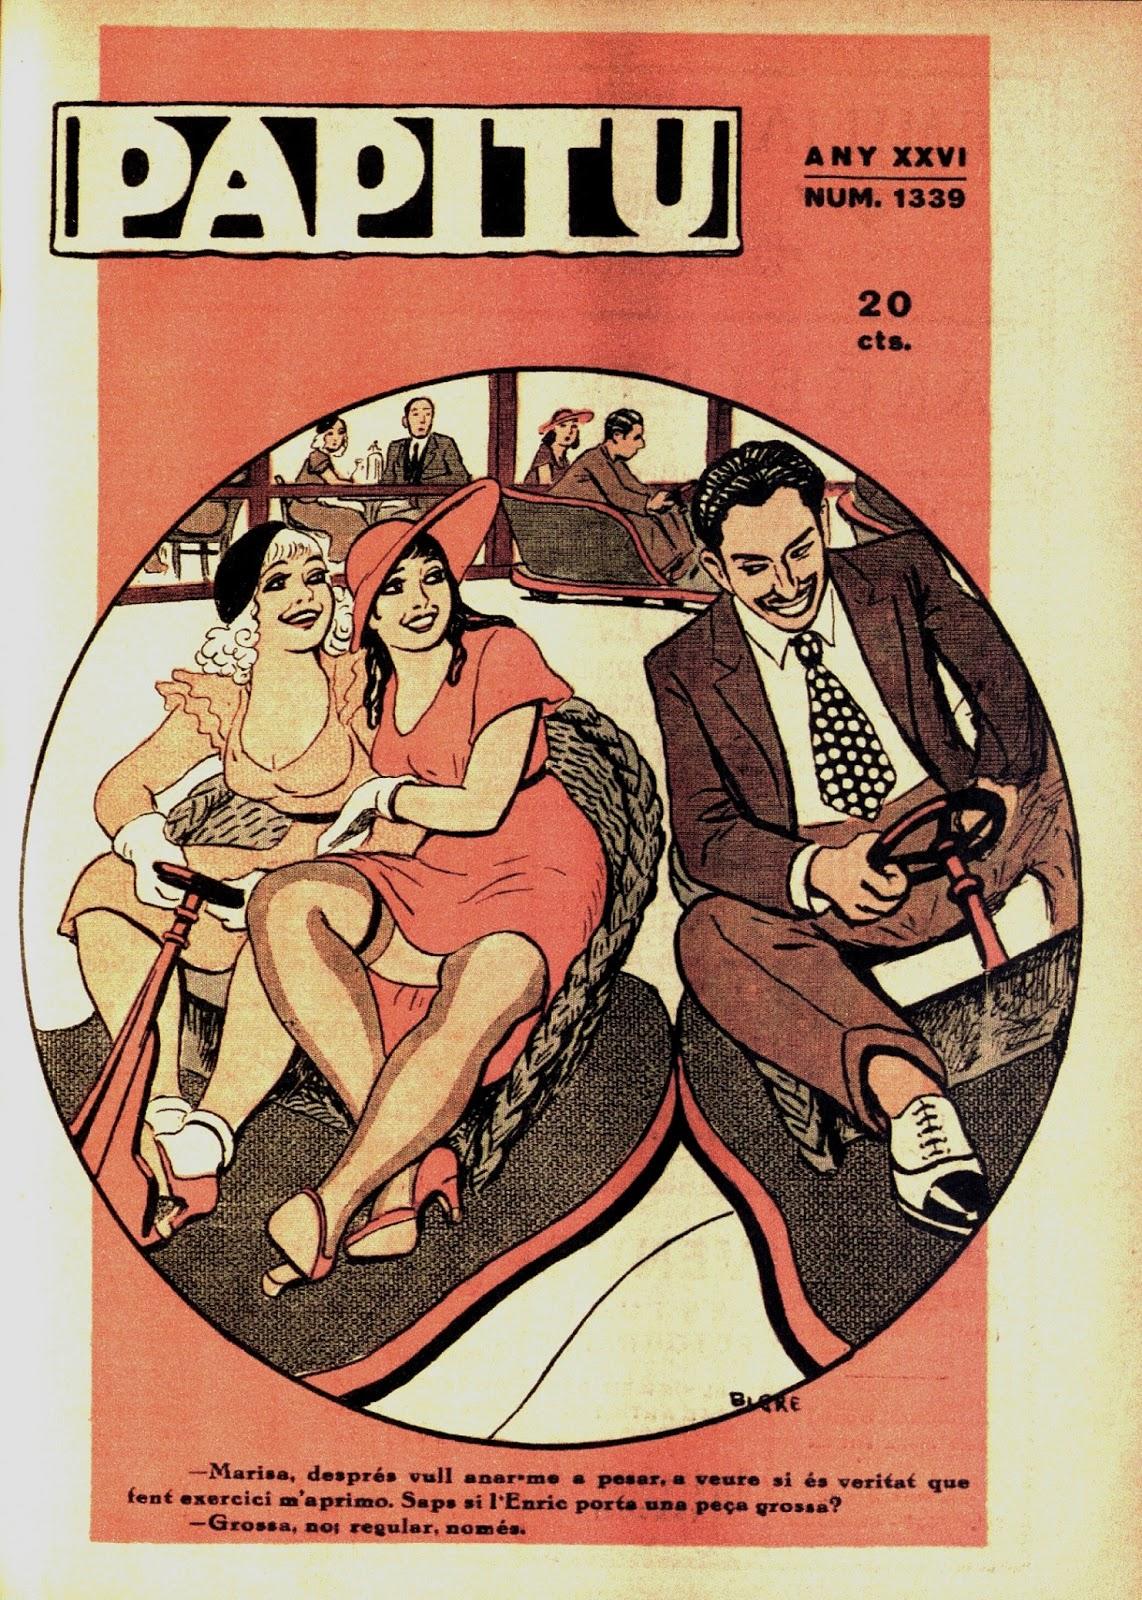 Revista Papitu, novembre 1934, portada per Ricard Opisso